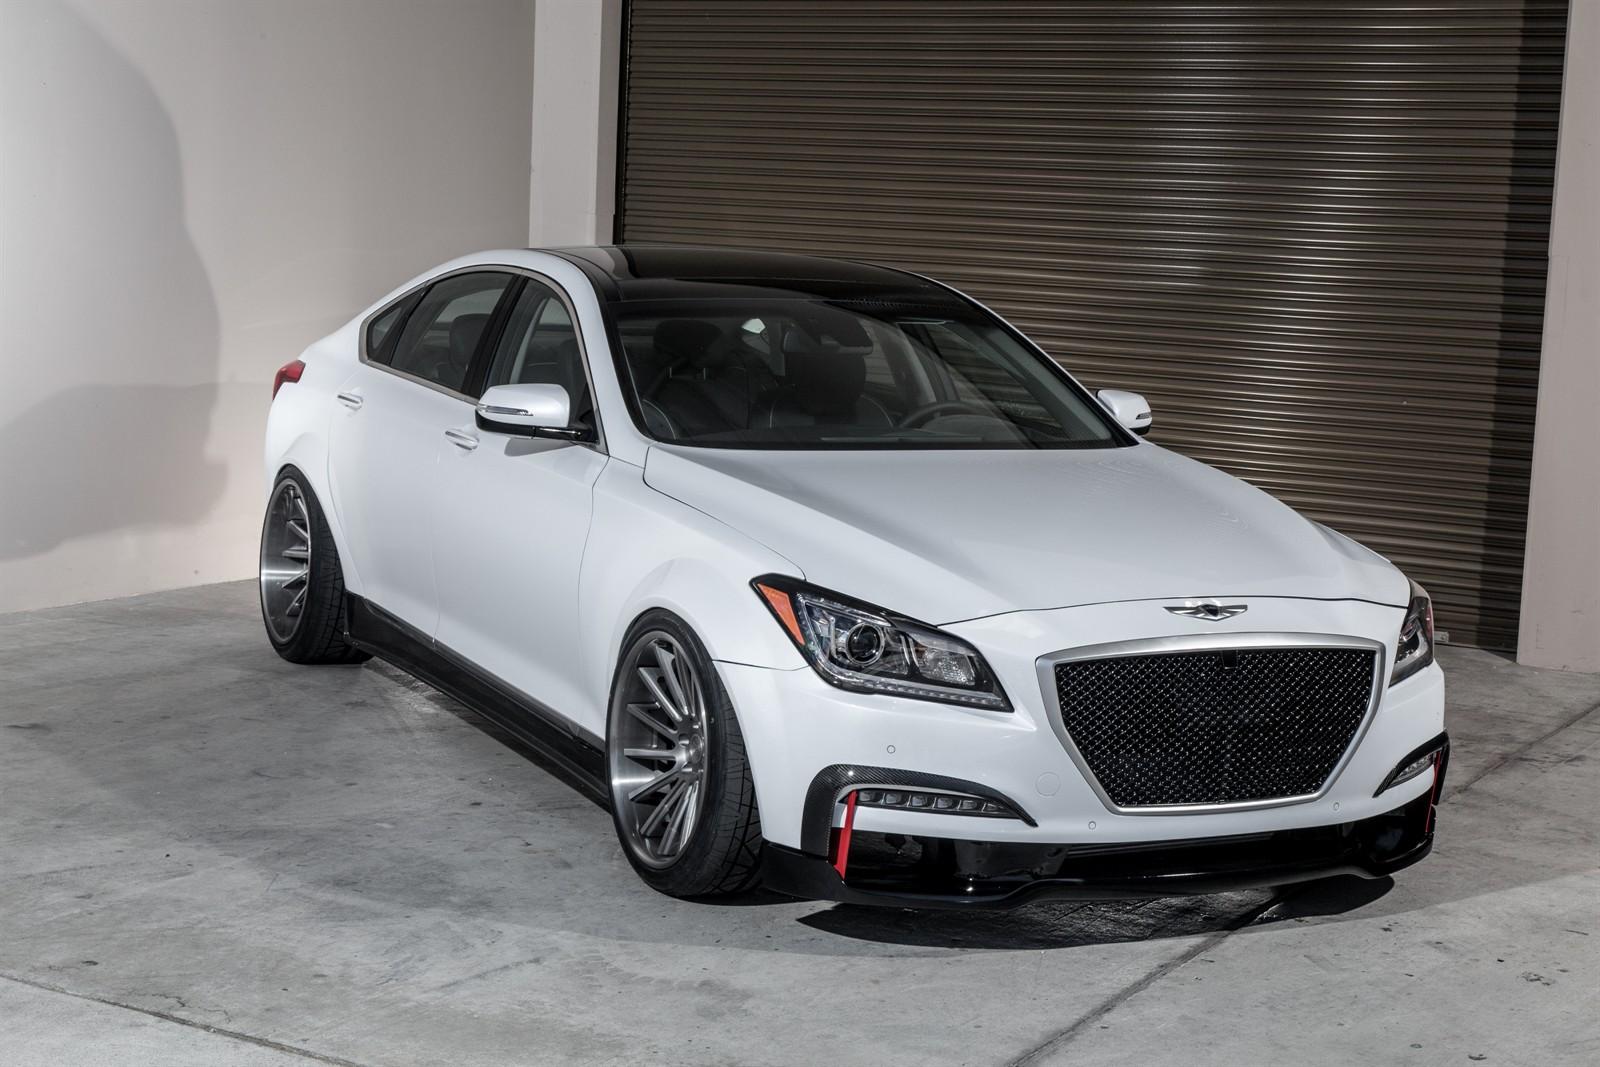 ARK Performance Puts Extra Performance & Luxury to the Genesis Sedan